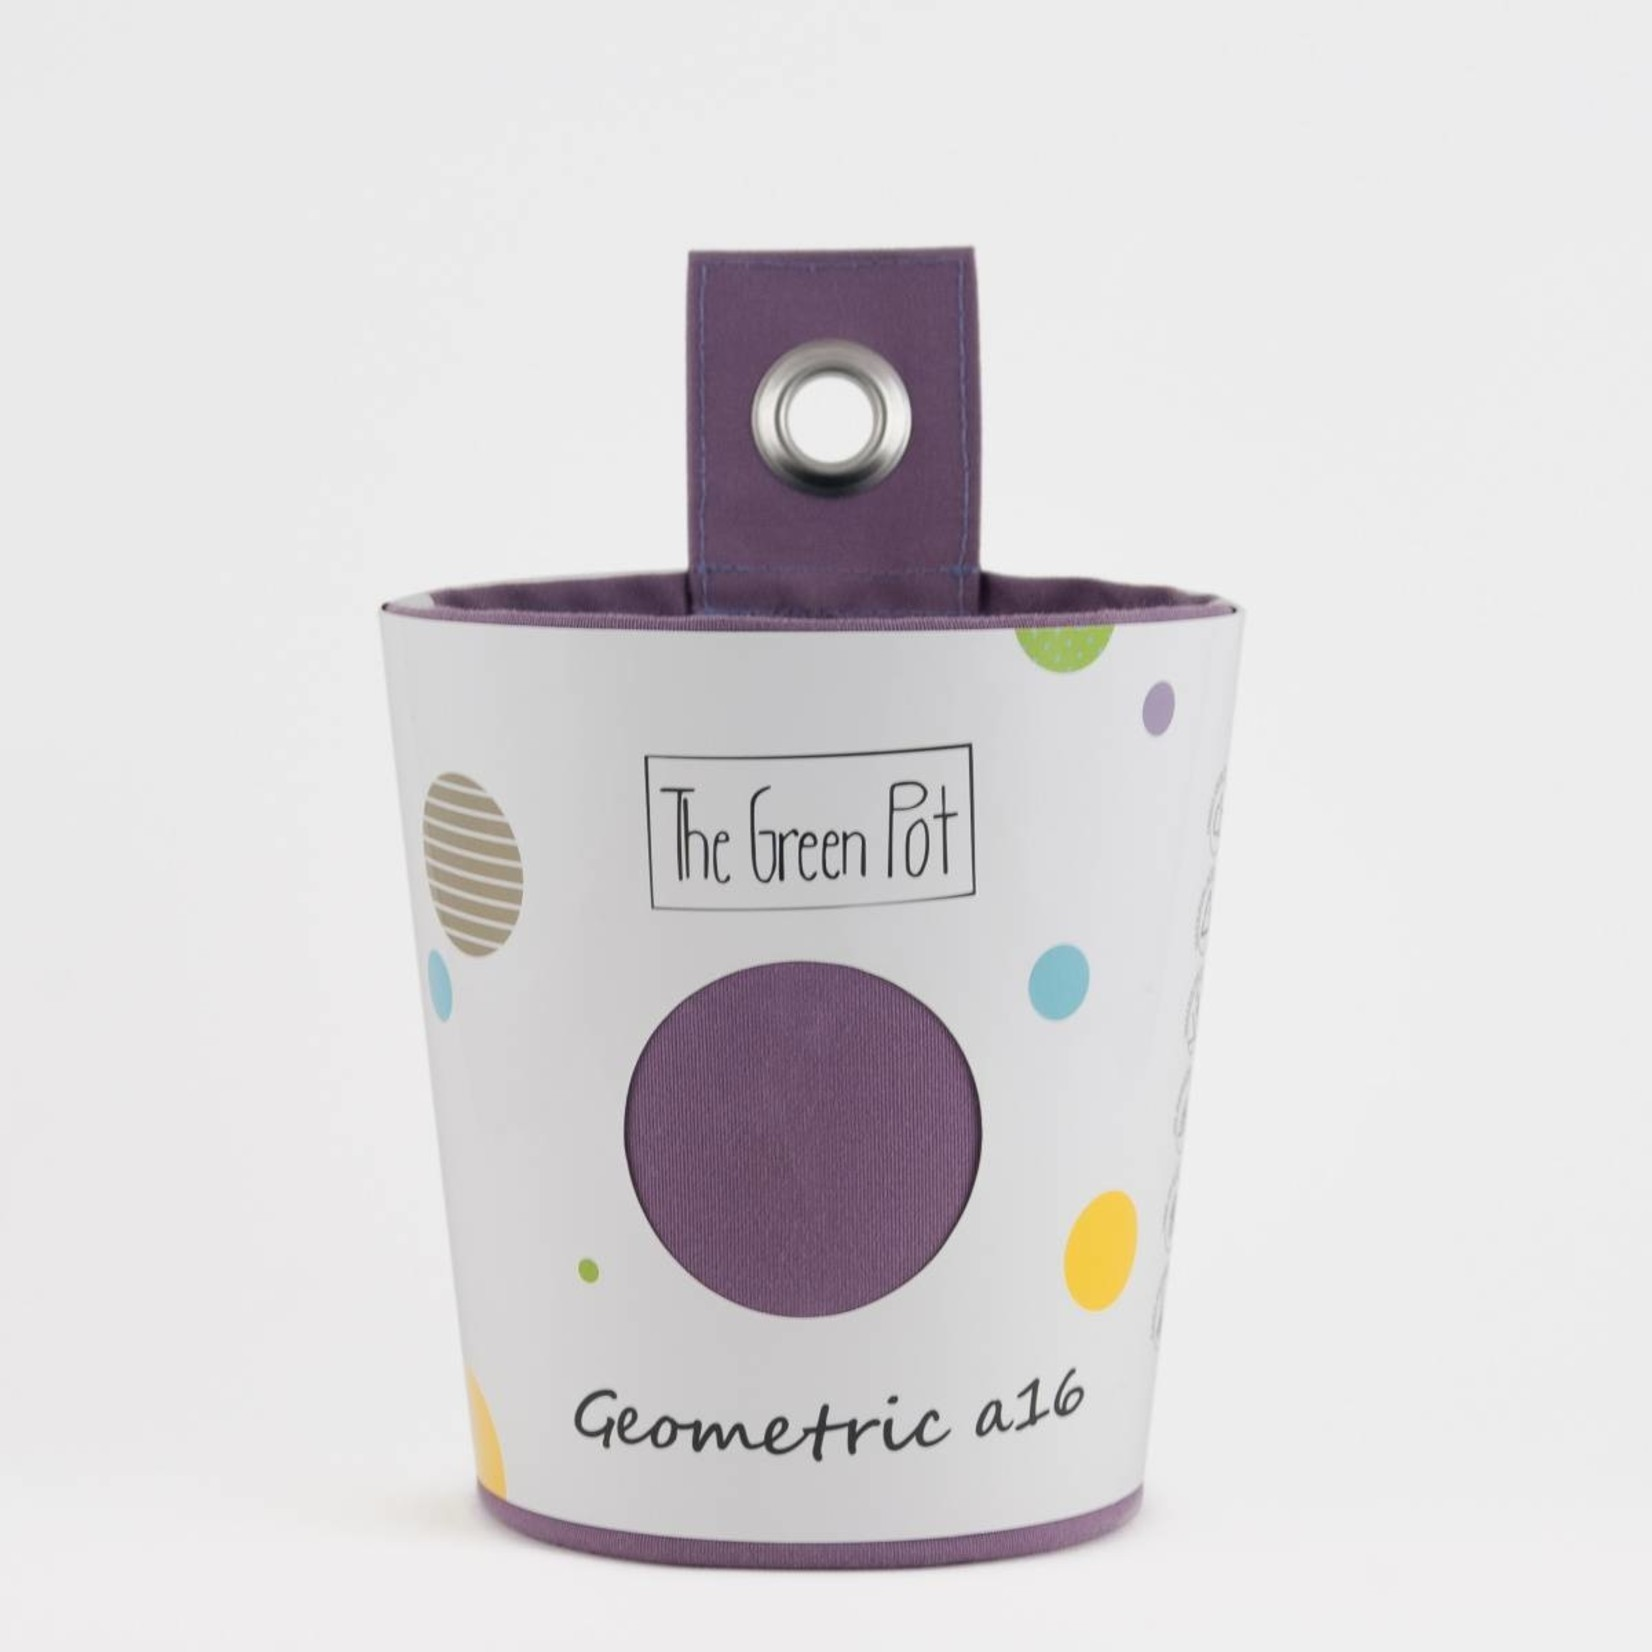 The green pot Lavender